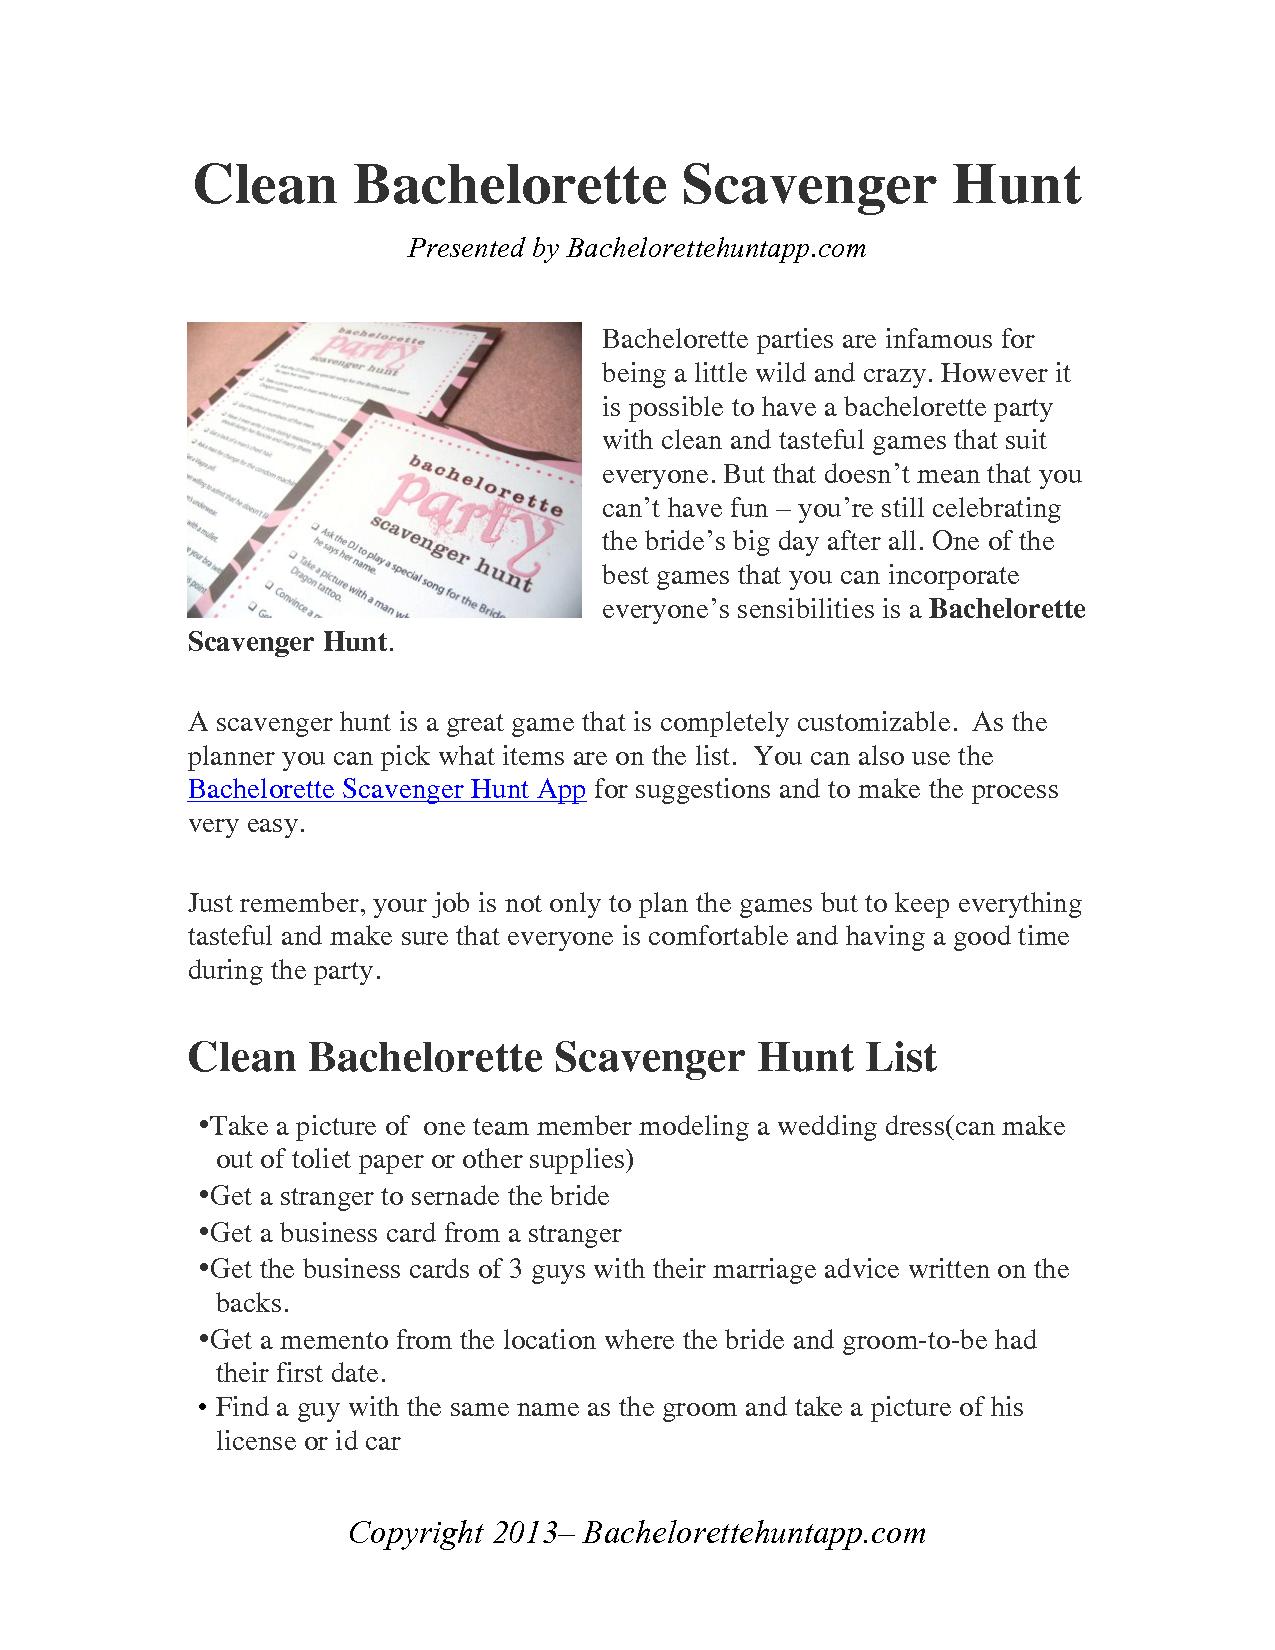 Classy Clean Bachelorette Scavenger Hunt Checklist Bachelorette Scavenger Hunt Trendy Bachelorette Party Awesome Bachelorette Party